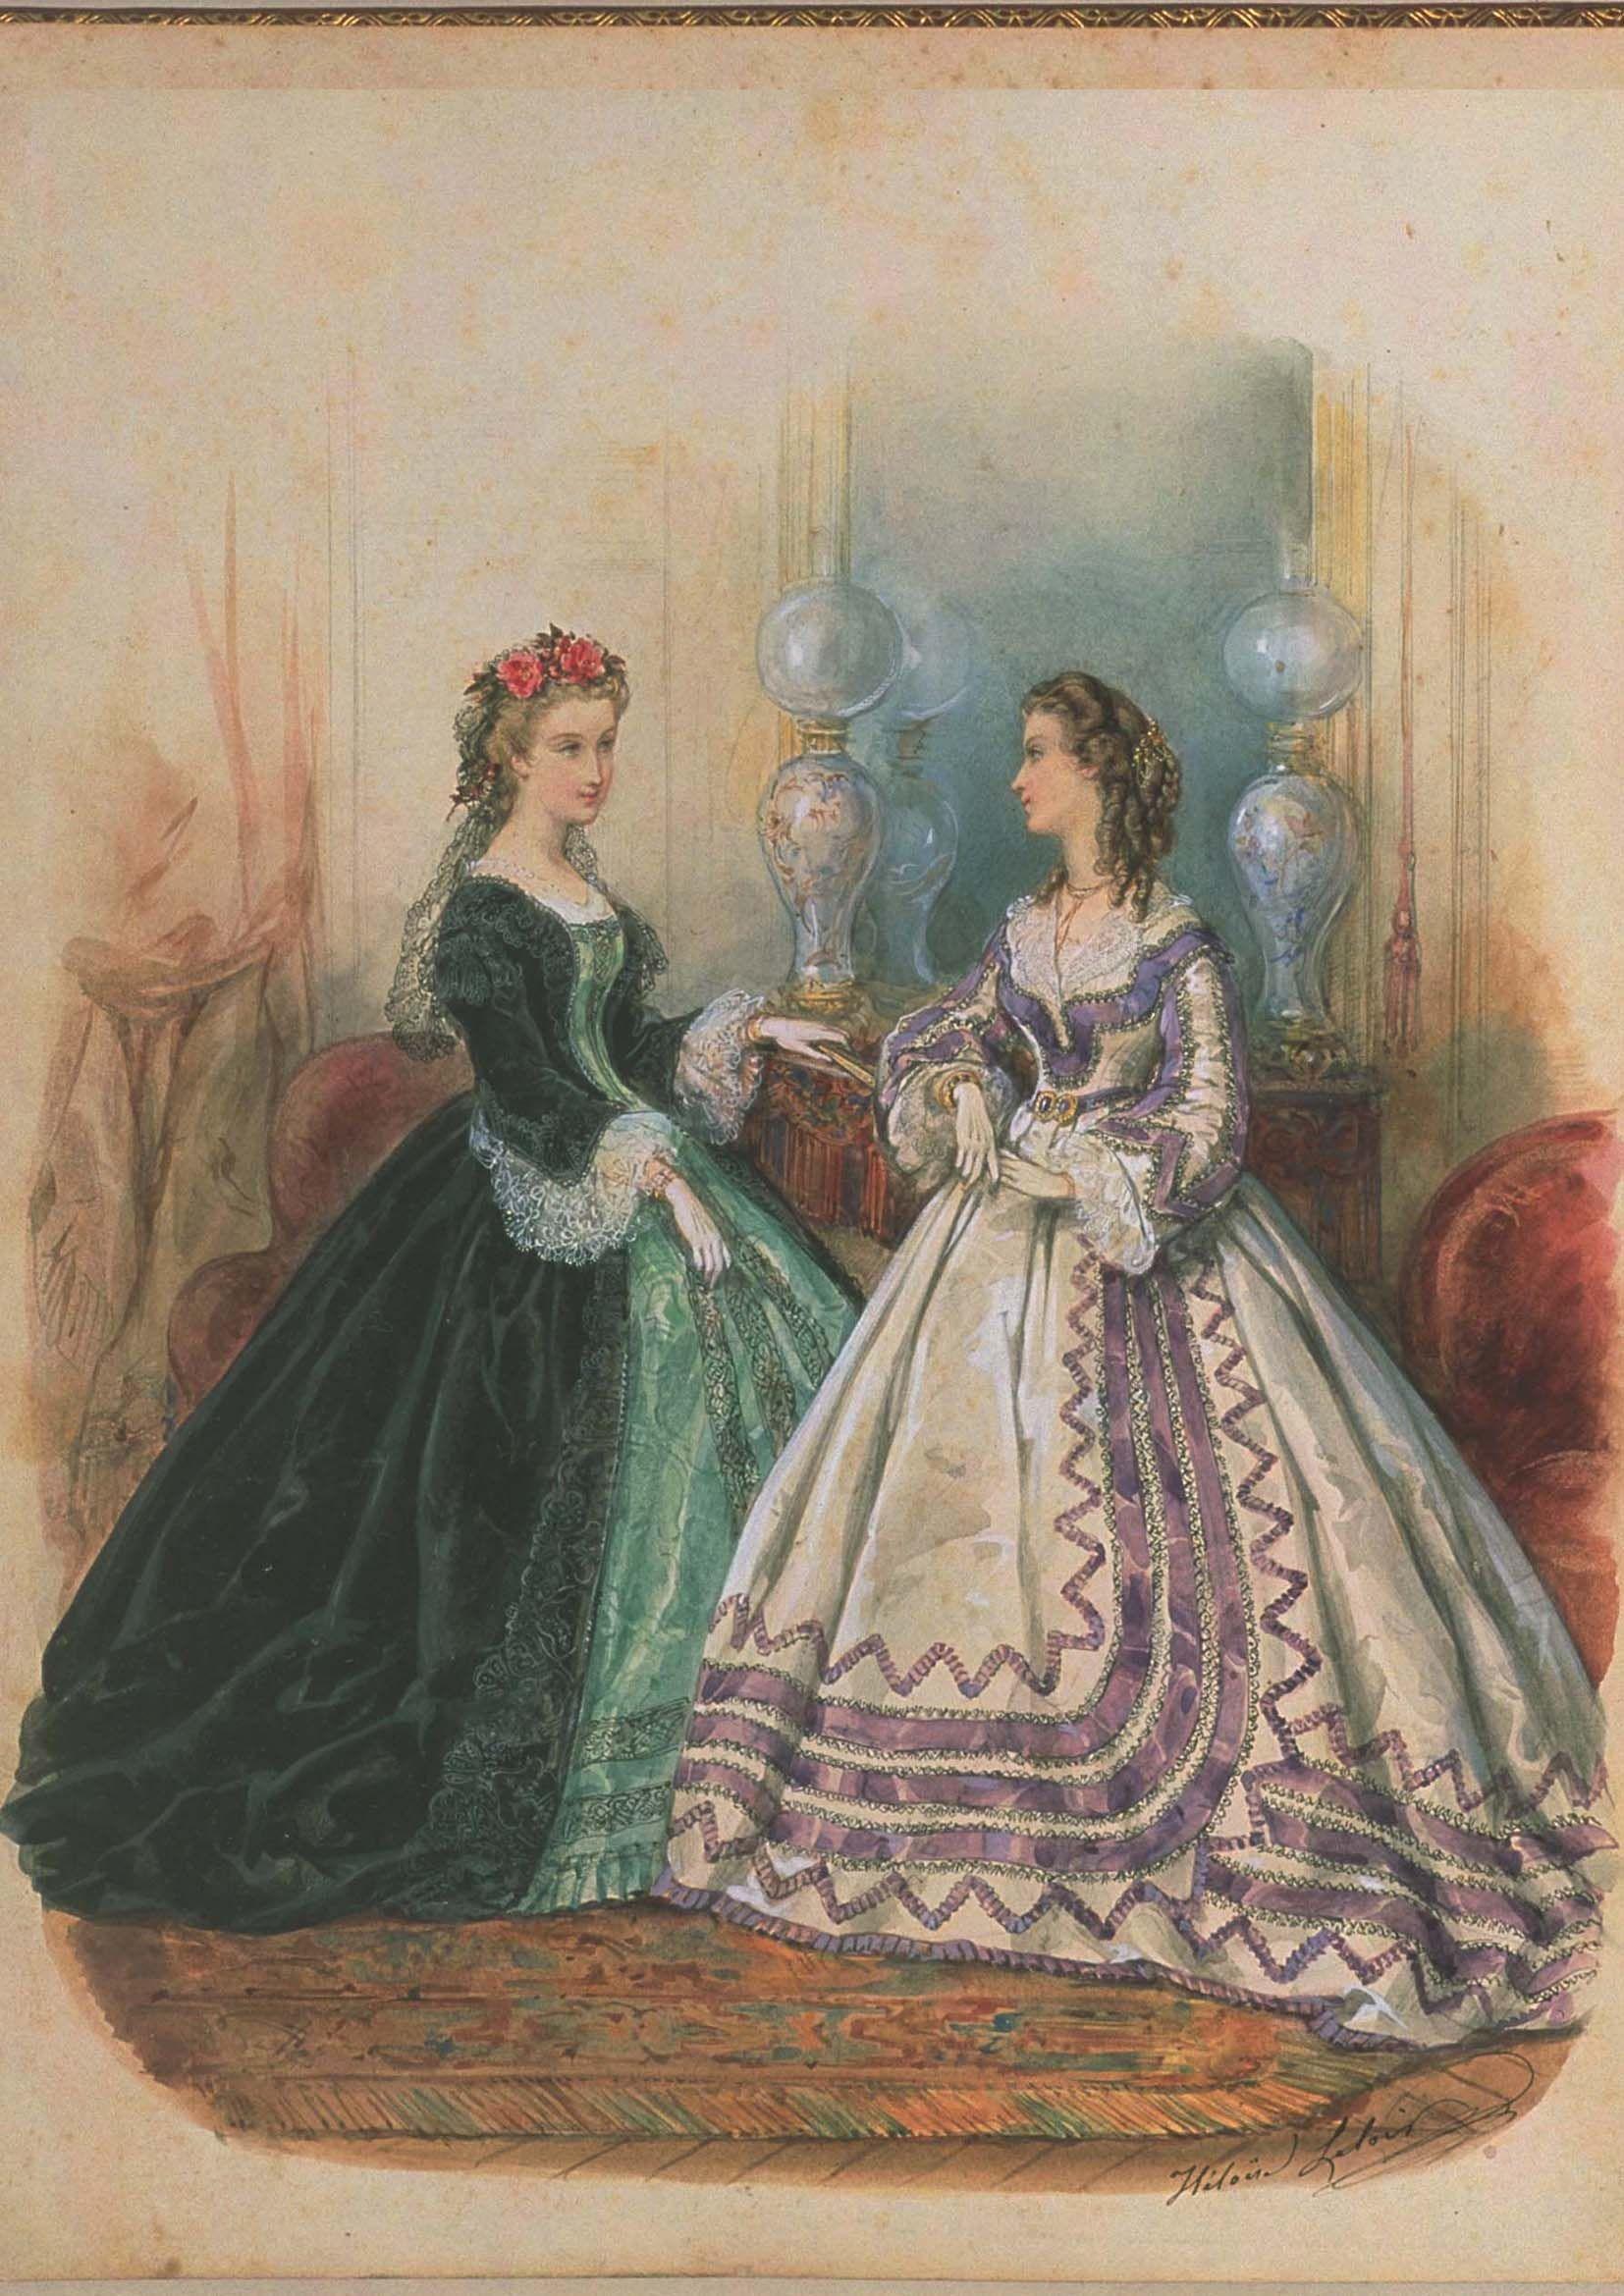 Pin on Fashion and Dress History